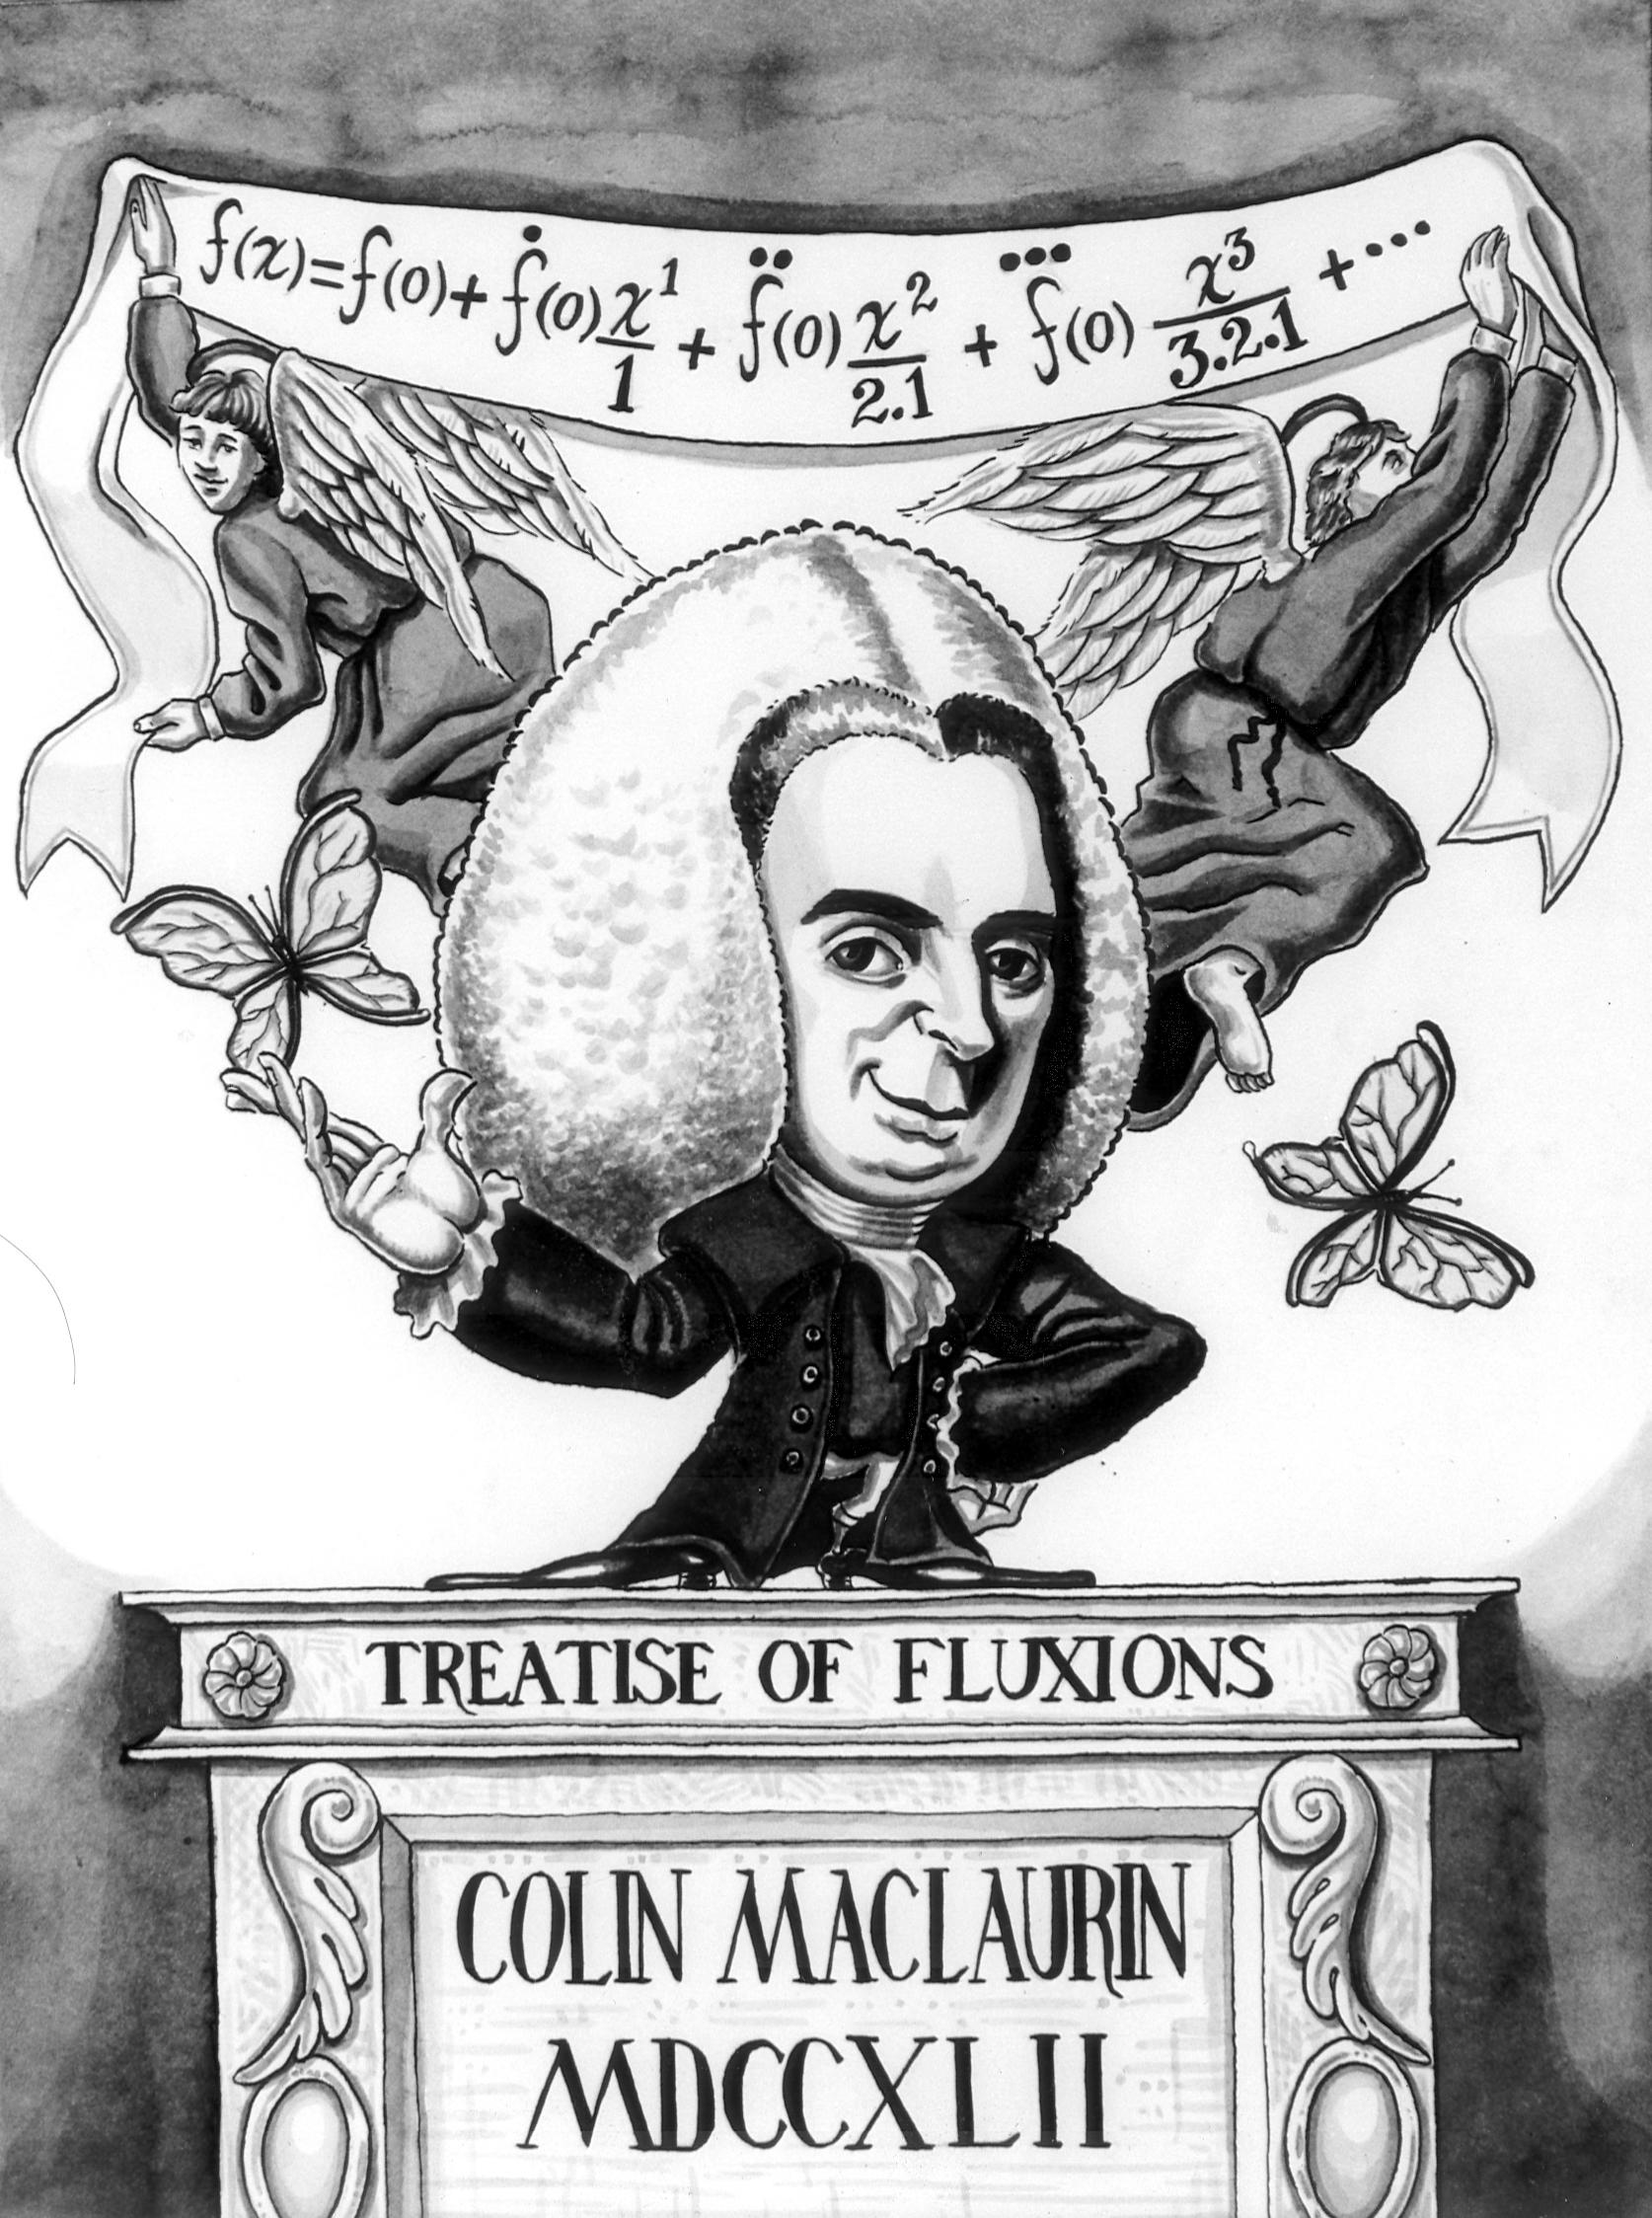 Colin Maclaurin (1698, 1746)